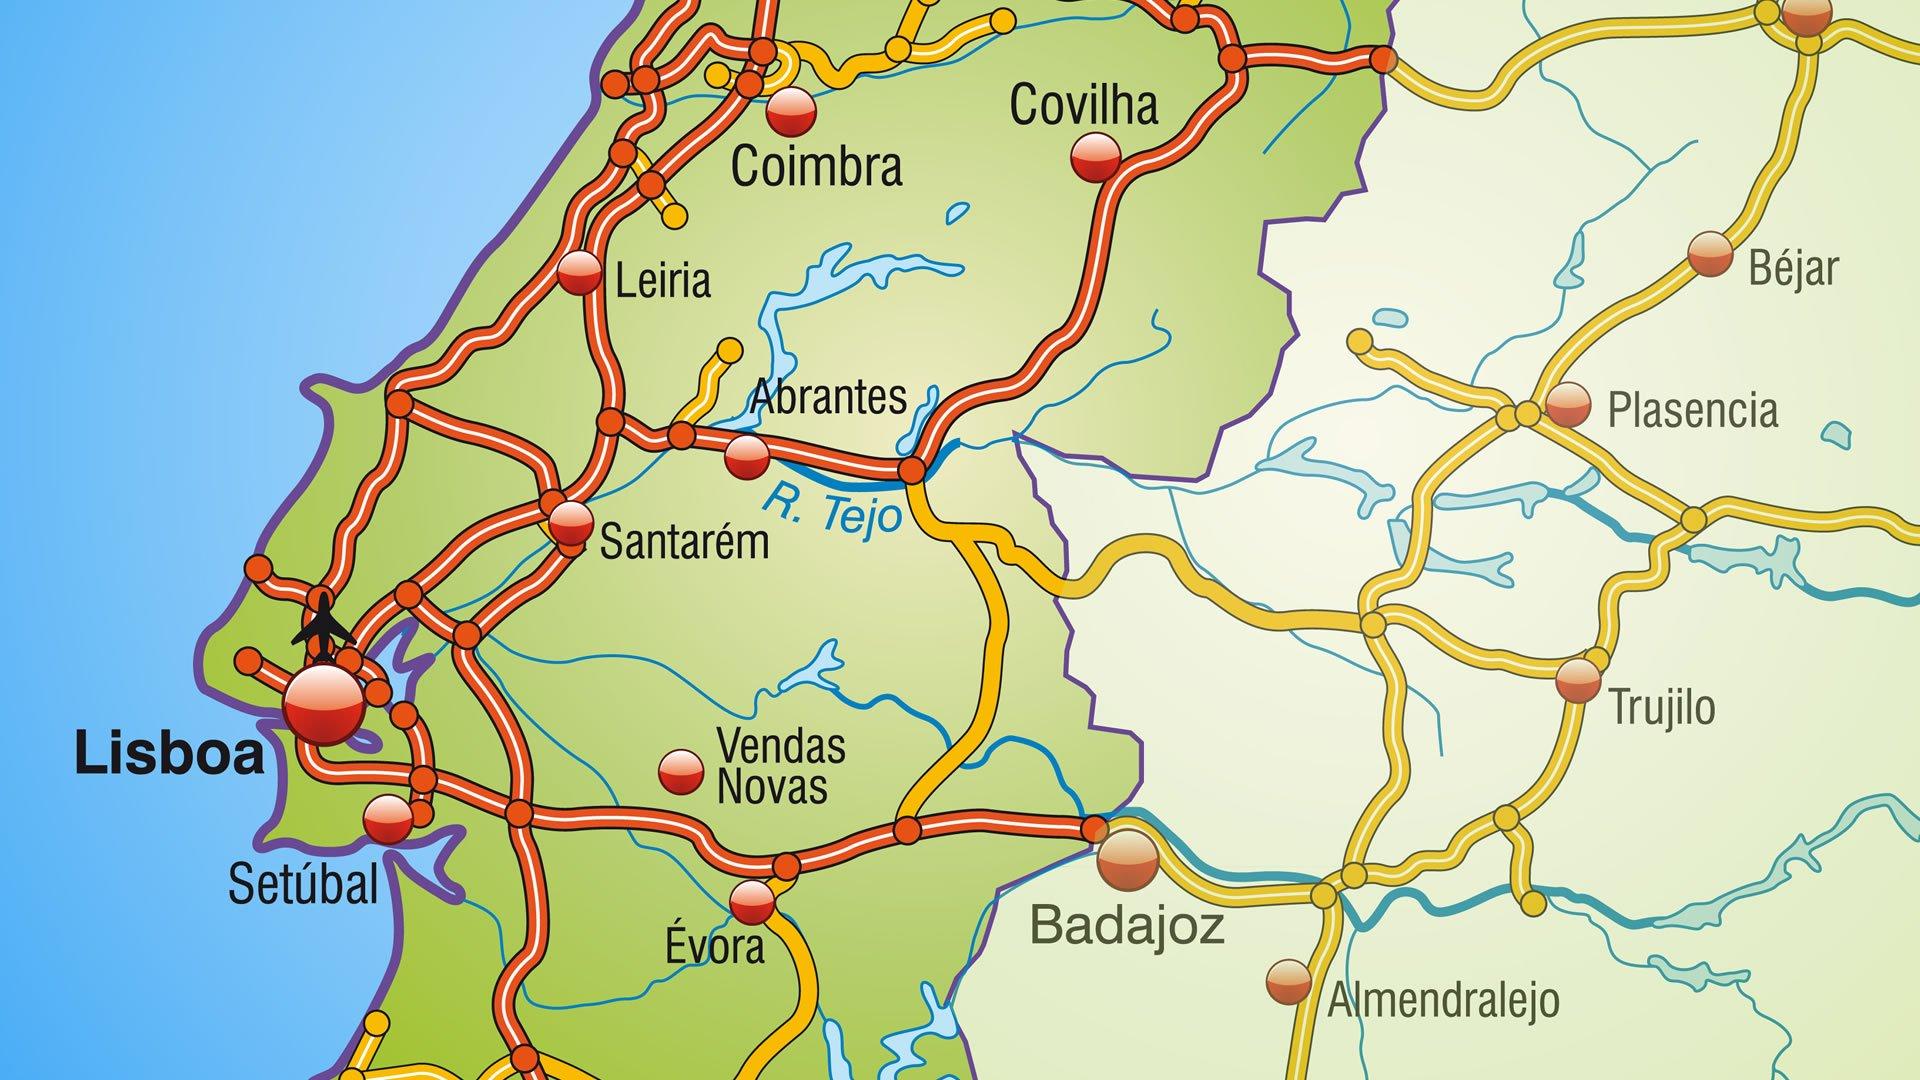 mapa da zona centro de portugal Mapa de autovías de Portugal: zona centro mapa da zona centro de portugal